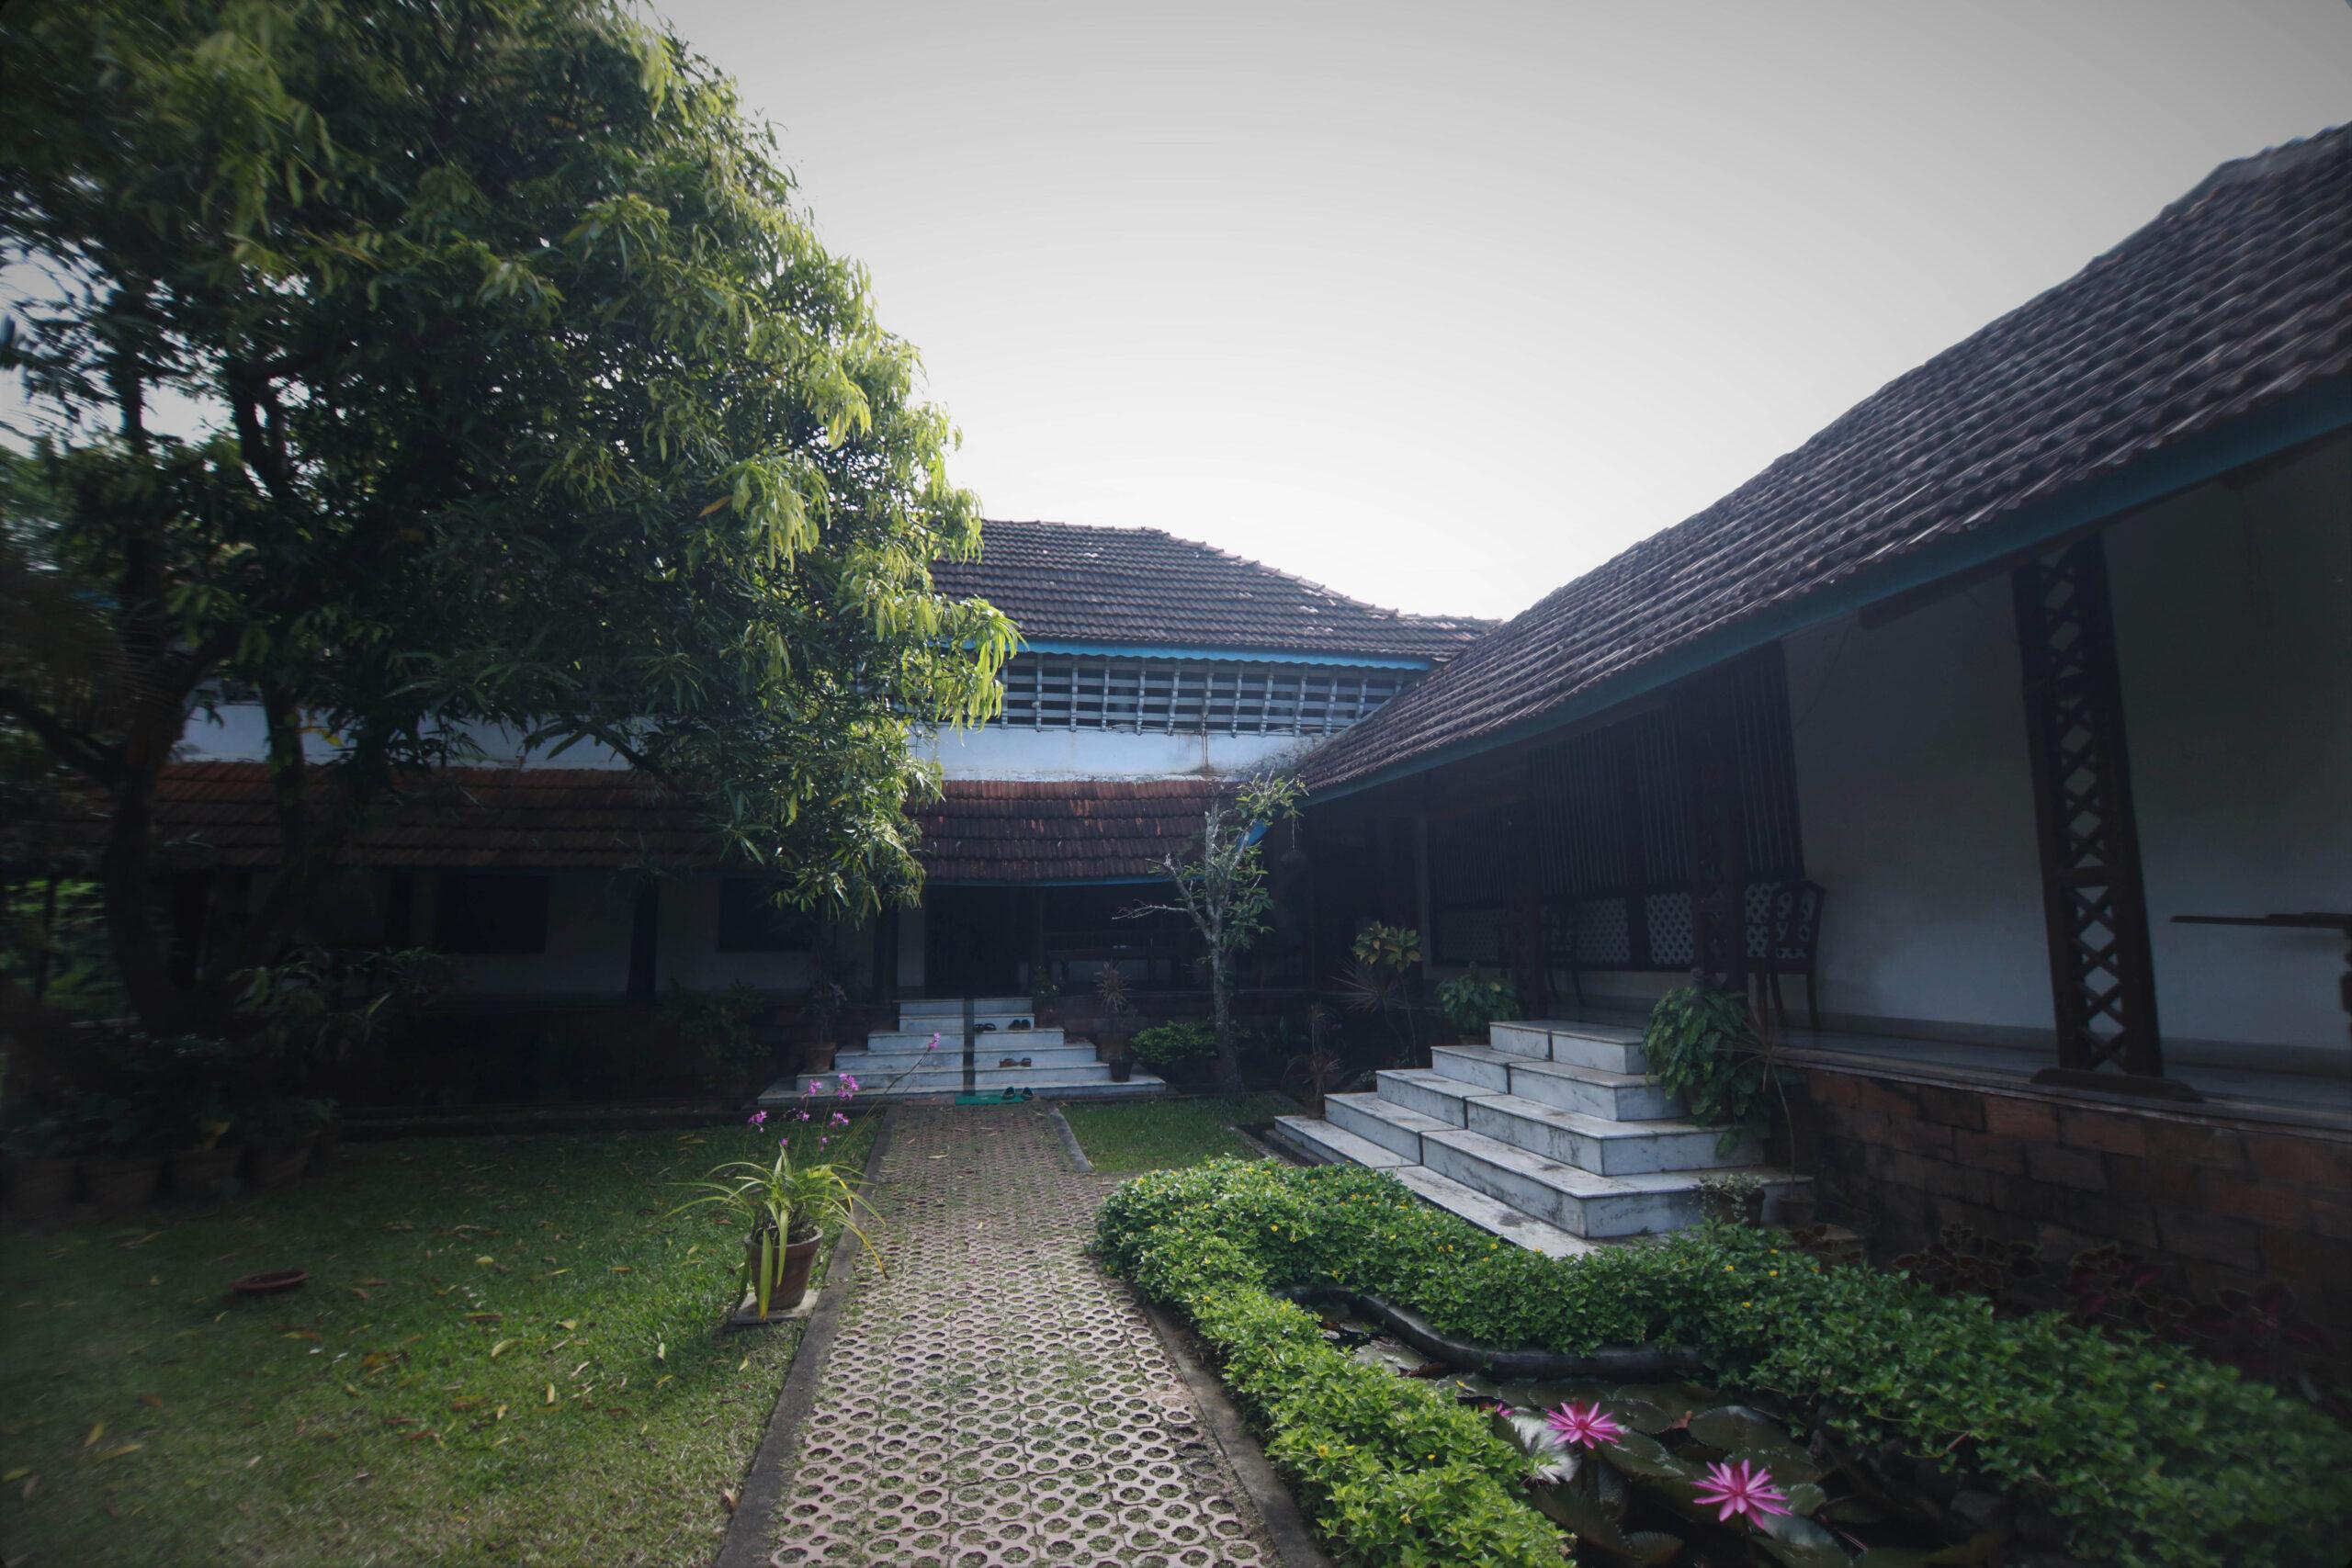 Kandath Tharavad - Palakkad - Rural & Remote - Icon